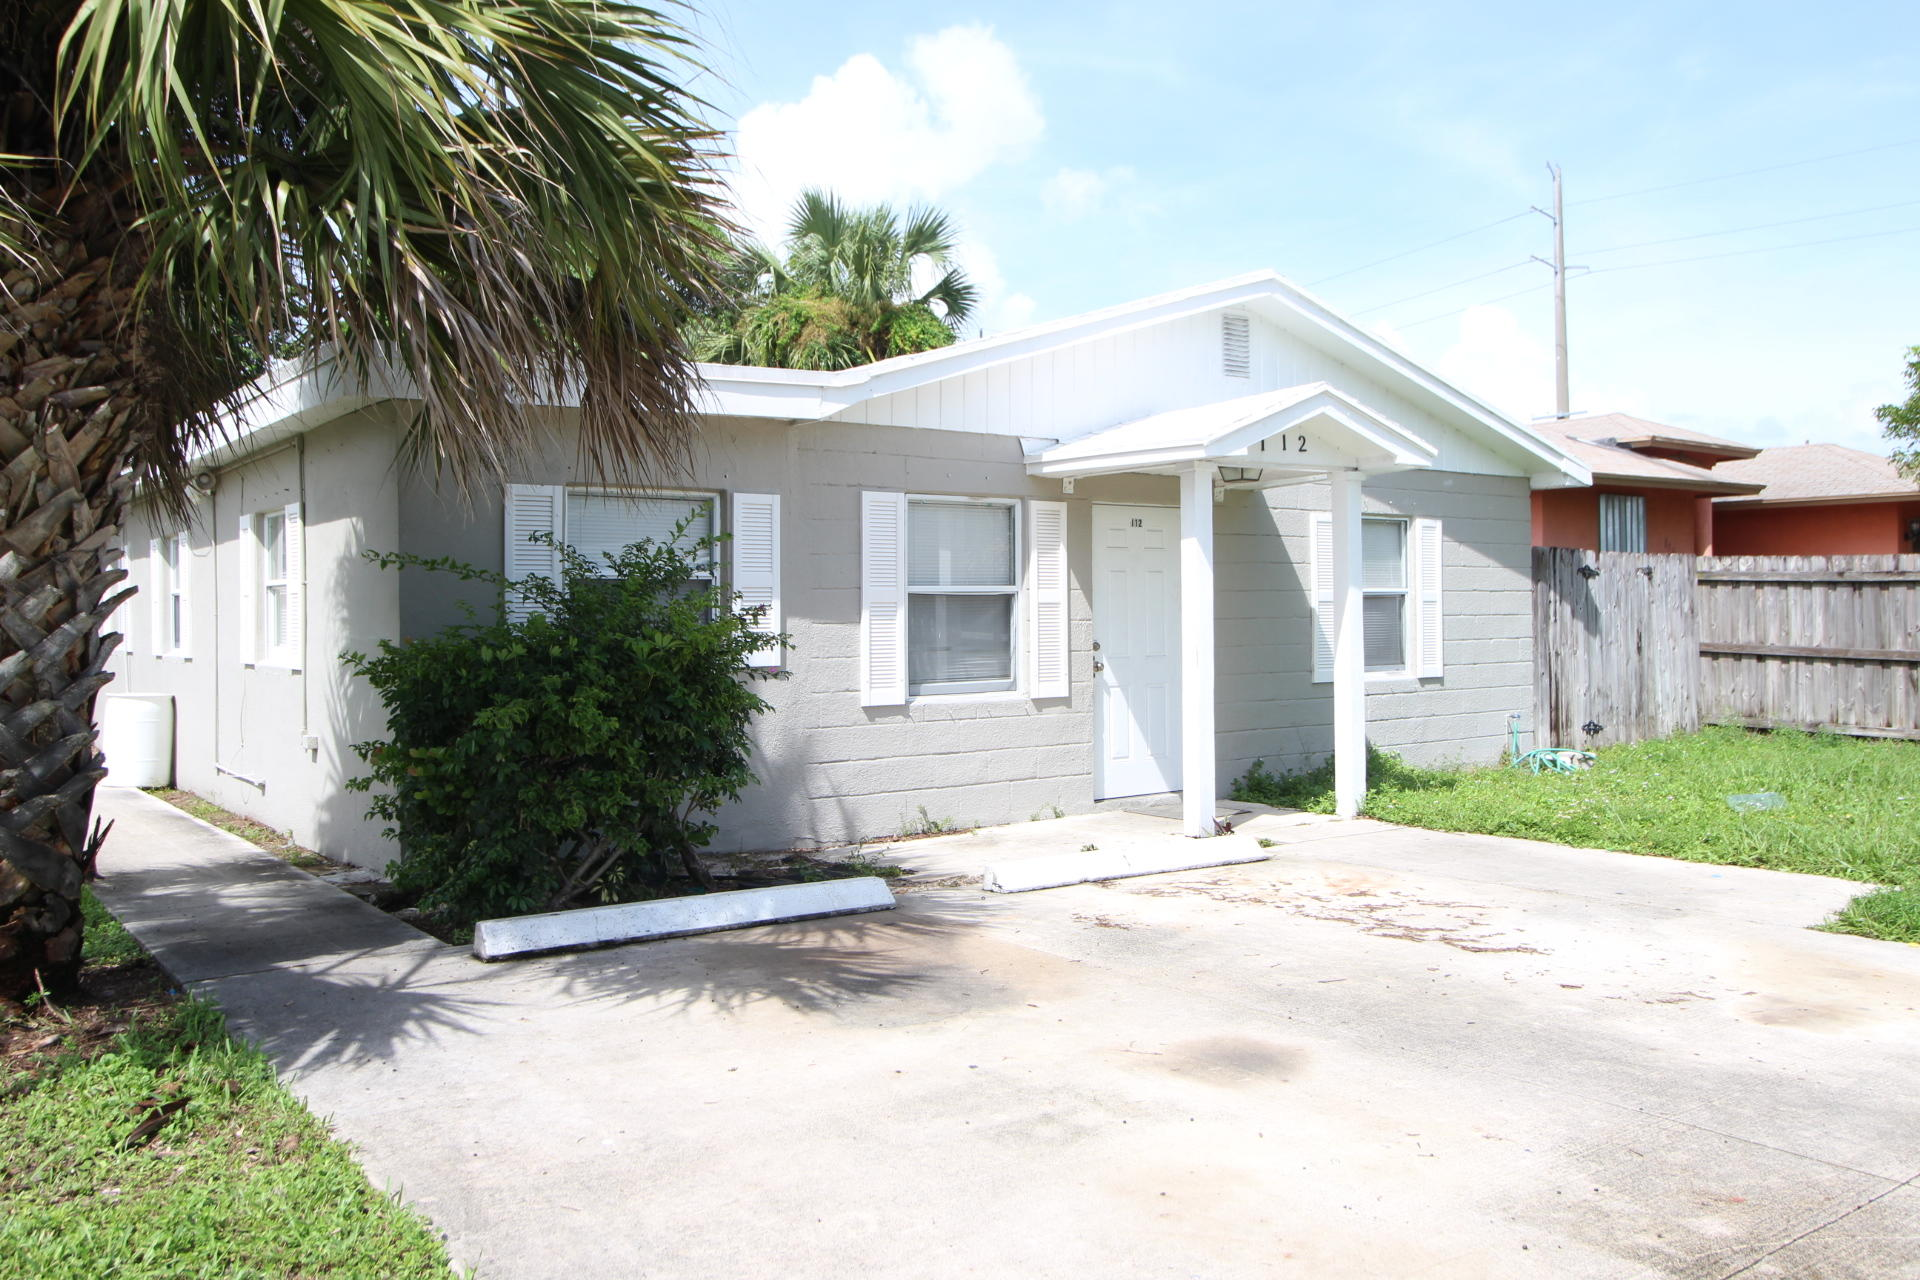 Details for 112 8th Avenue Sw, Delray Beach, FL 33444